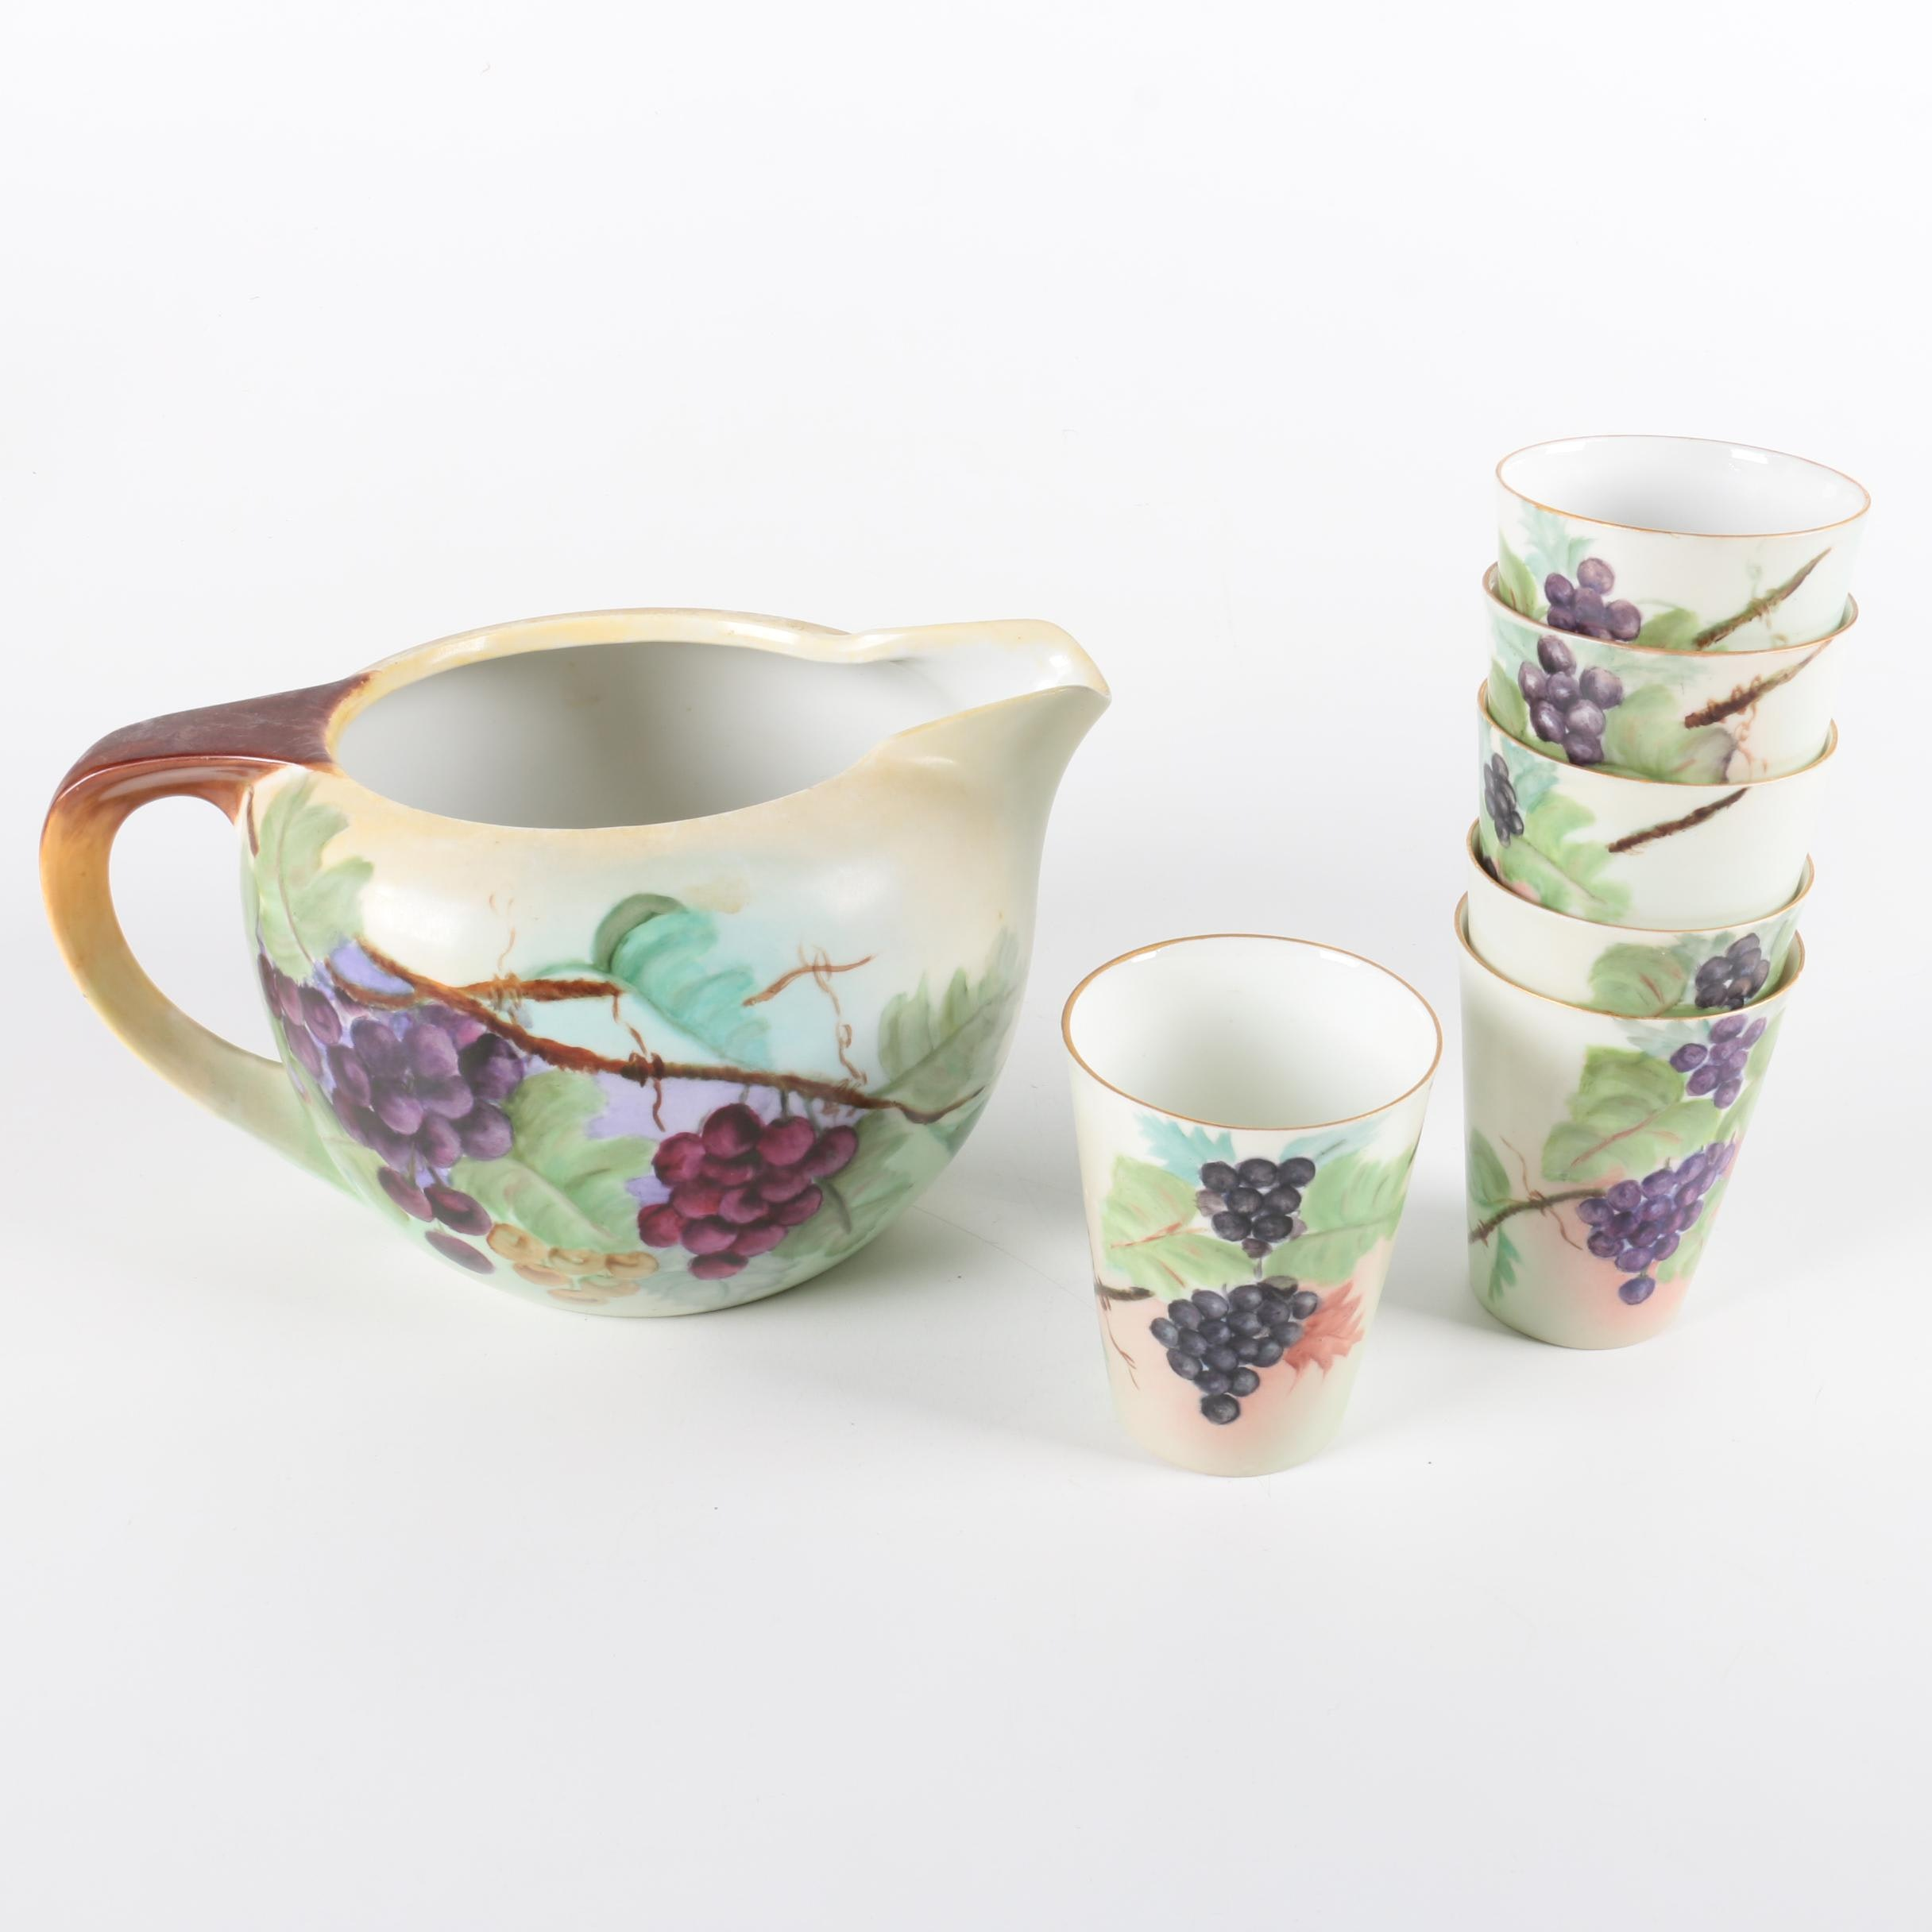 Vintage Noritake Hand Painted Porcelain Serveware